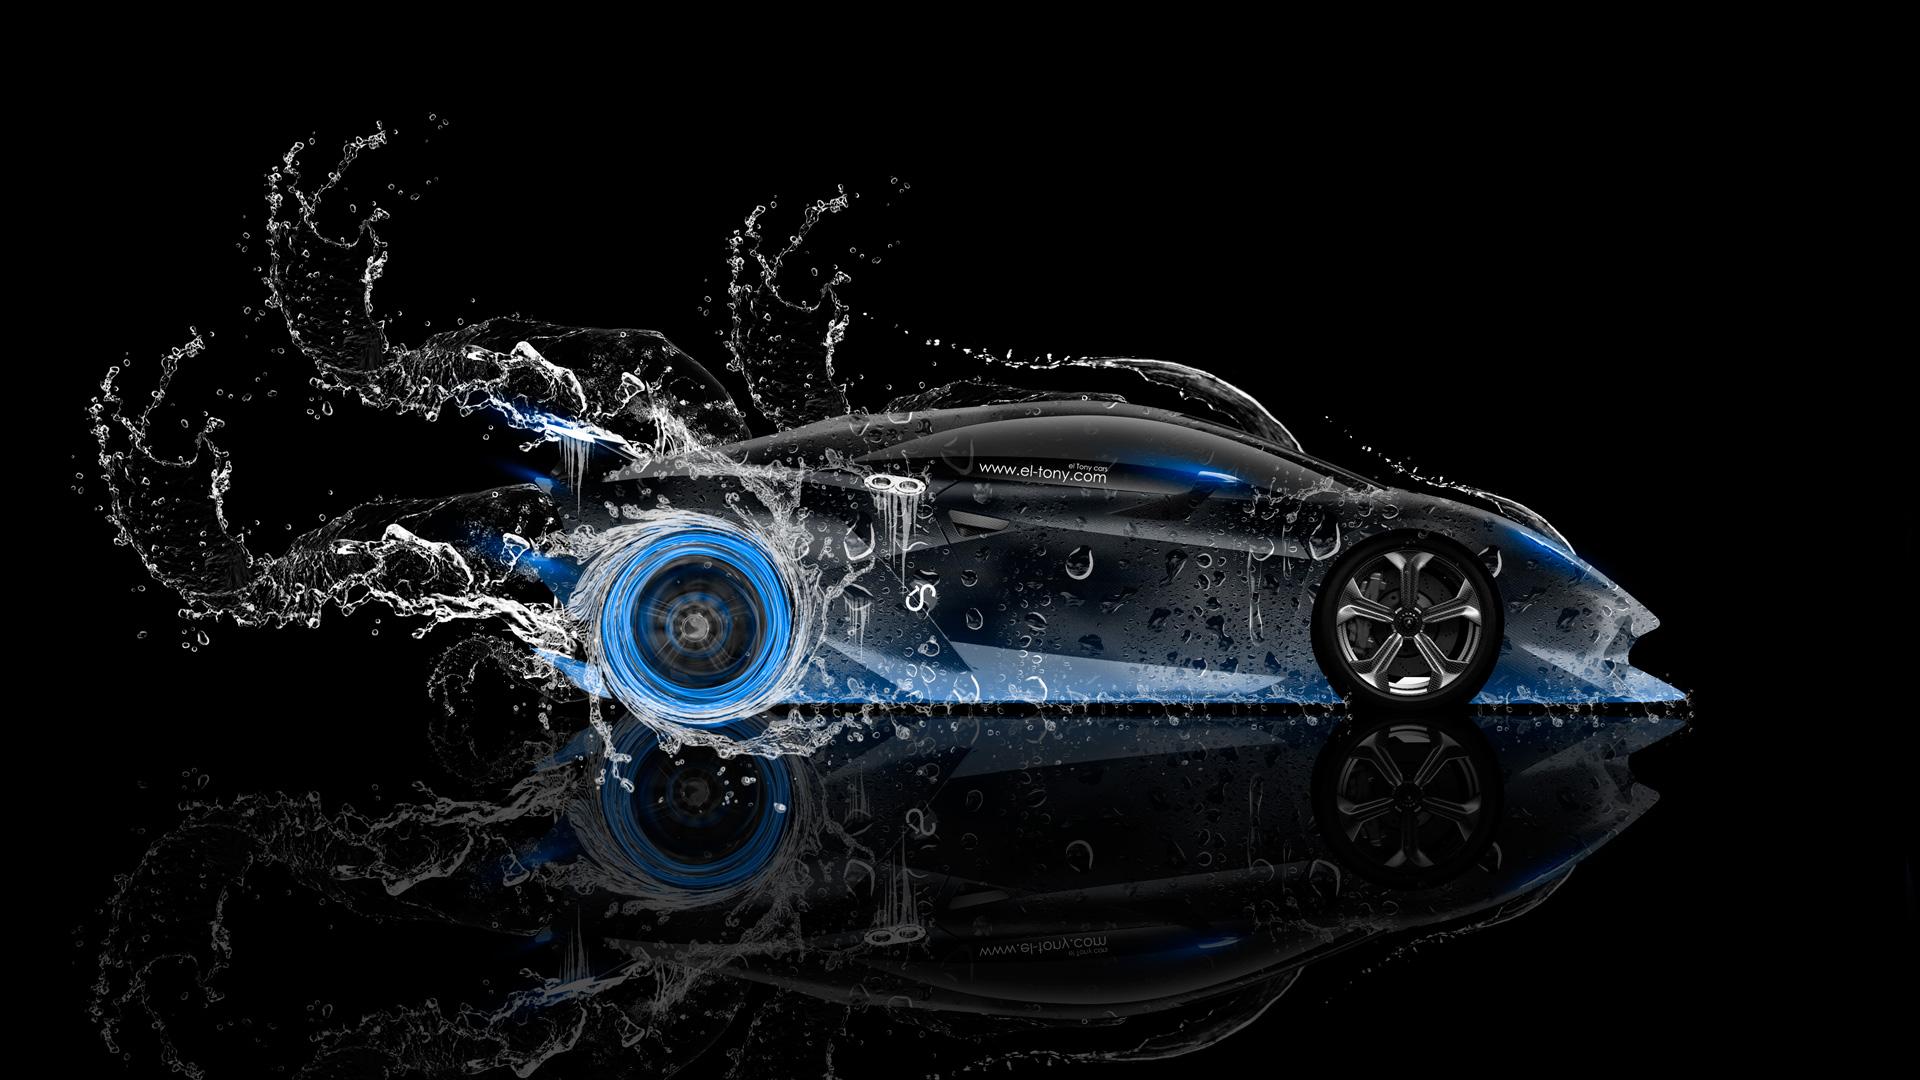 2014 Blue Neon HD Wallpapers Design By Tony Kokhan [wwwel Tonycom 1920x1080